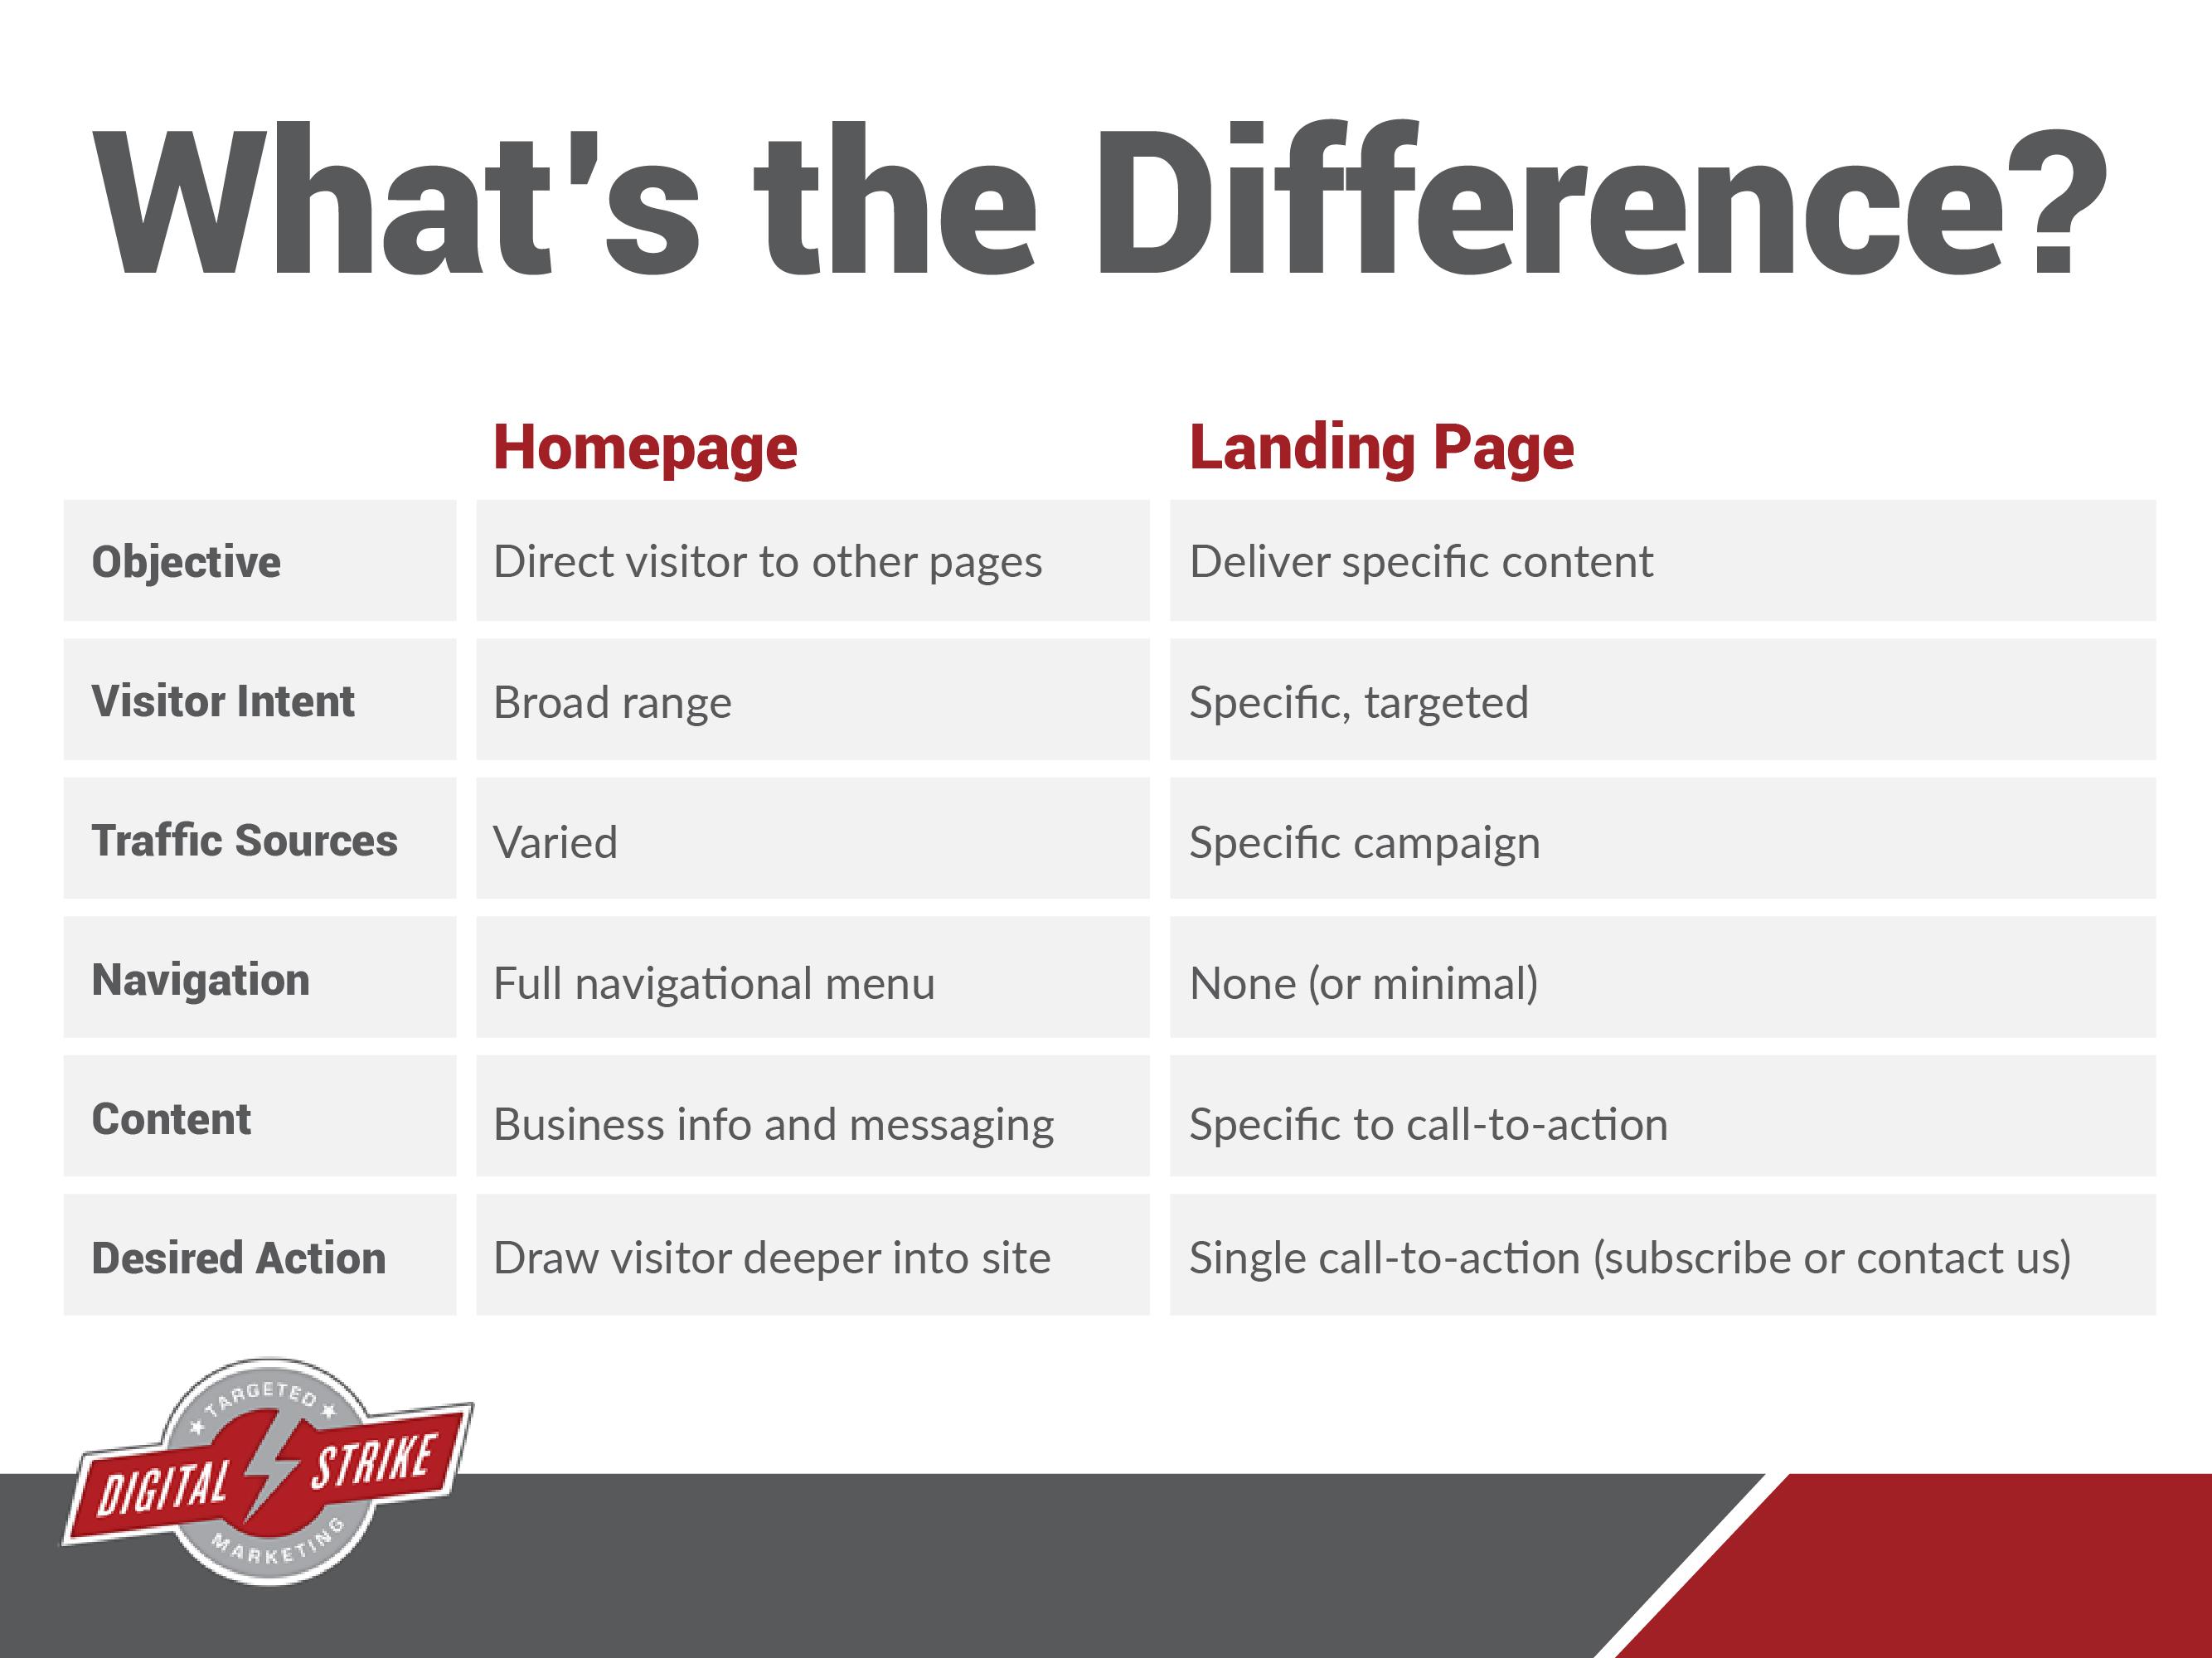 Landing Page vs. Homepage